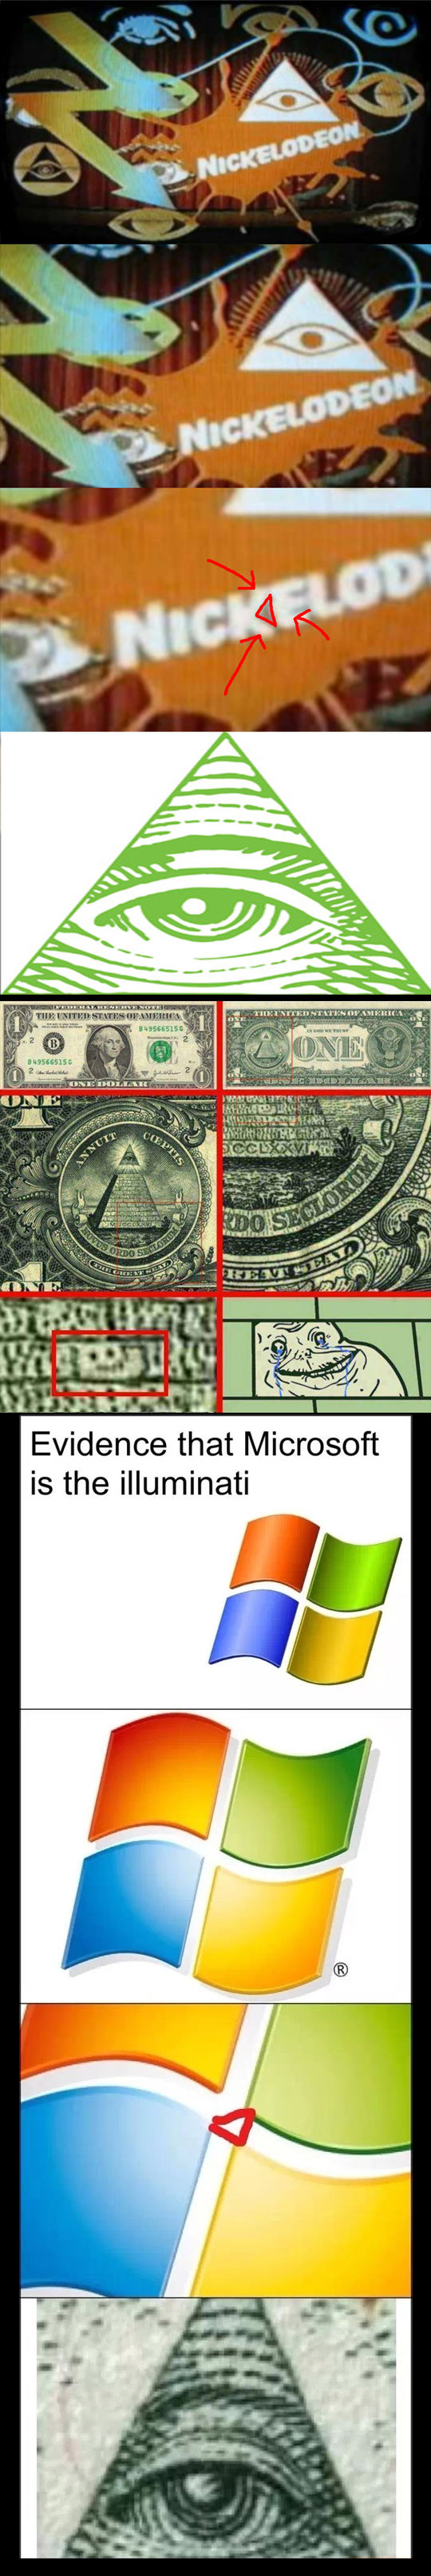 funny-Illuminati-conspiracy-triangle-games-dollar-Windows